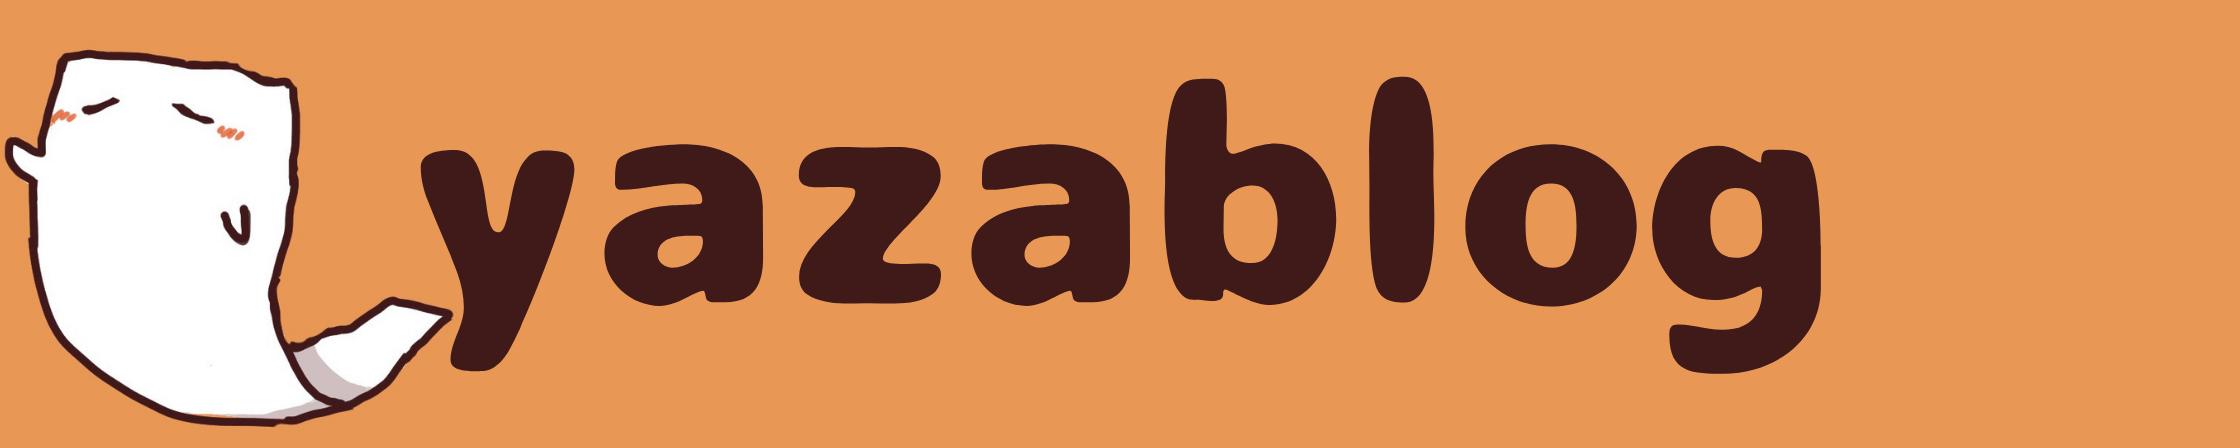 yazablog(やざブログ)